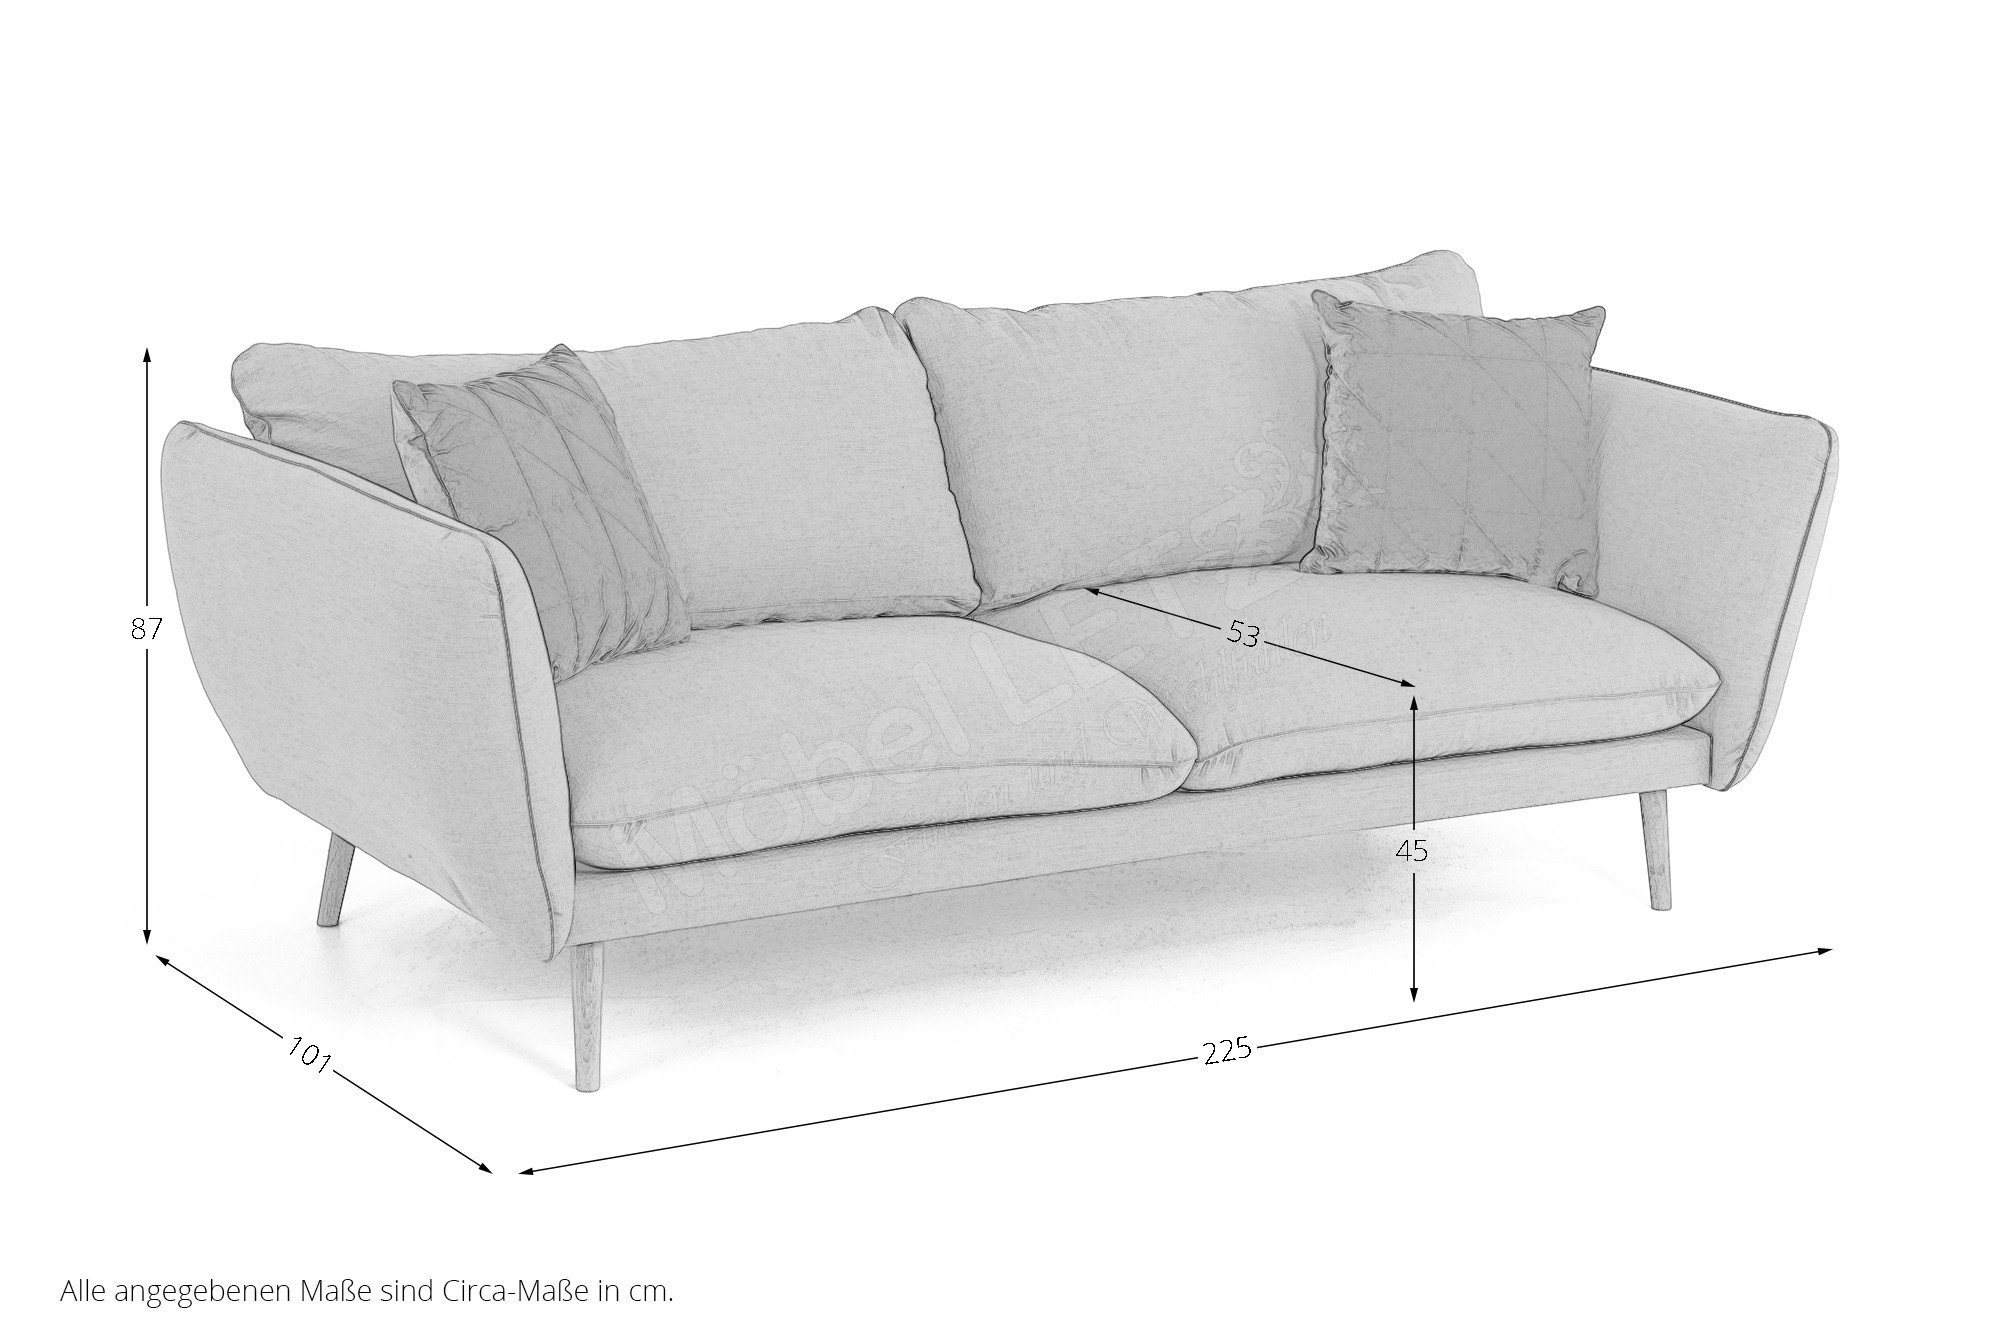 skandinavische m bel sander sofa in gr n m bel letz ihr online shop. Black Bedroom Furniture Sets. Home Design Ideas